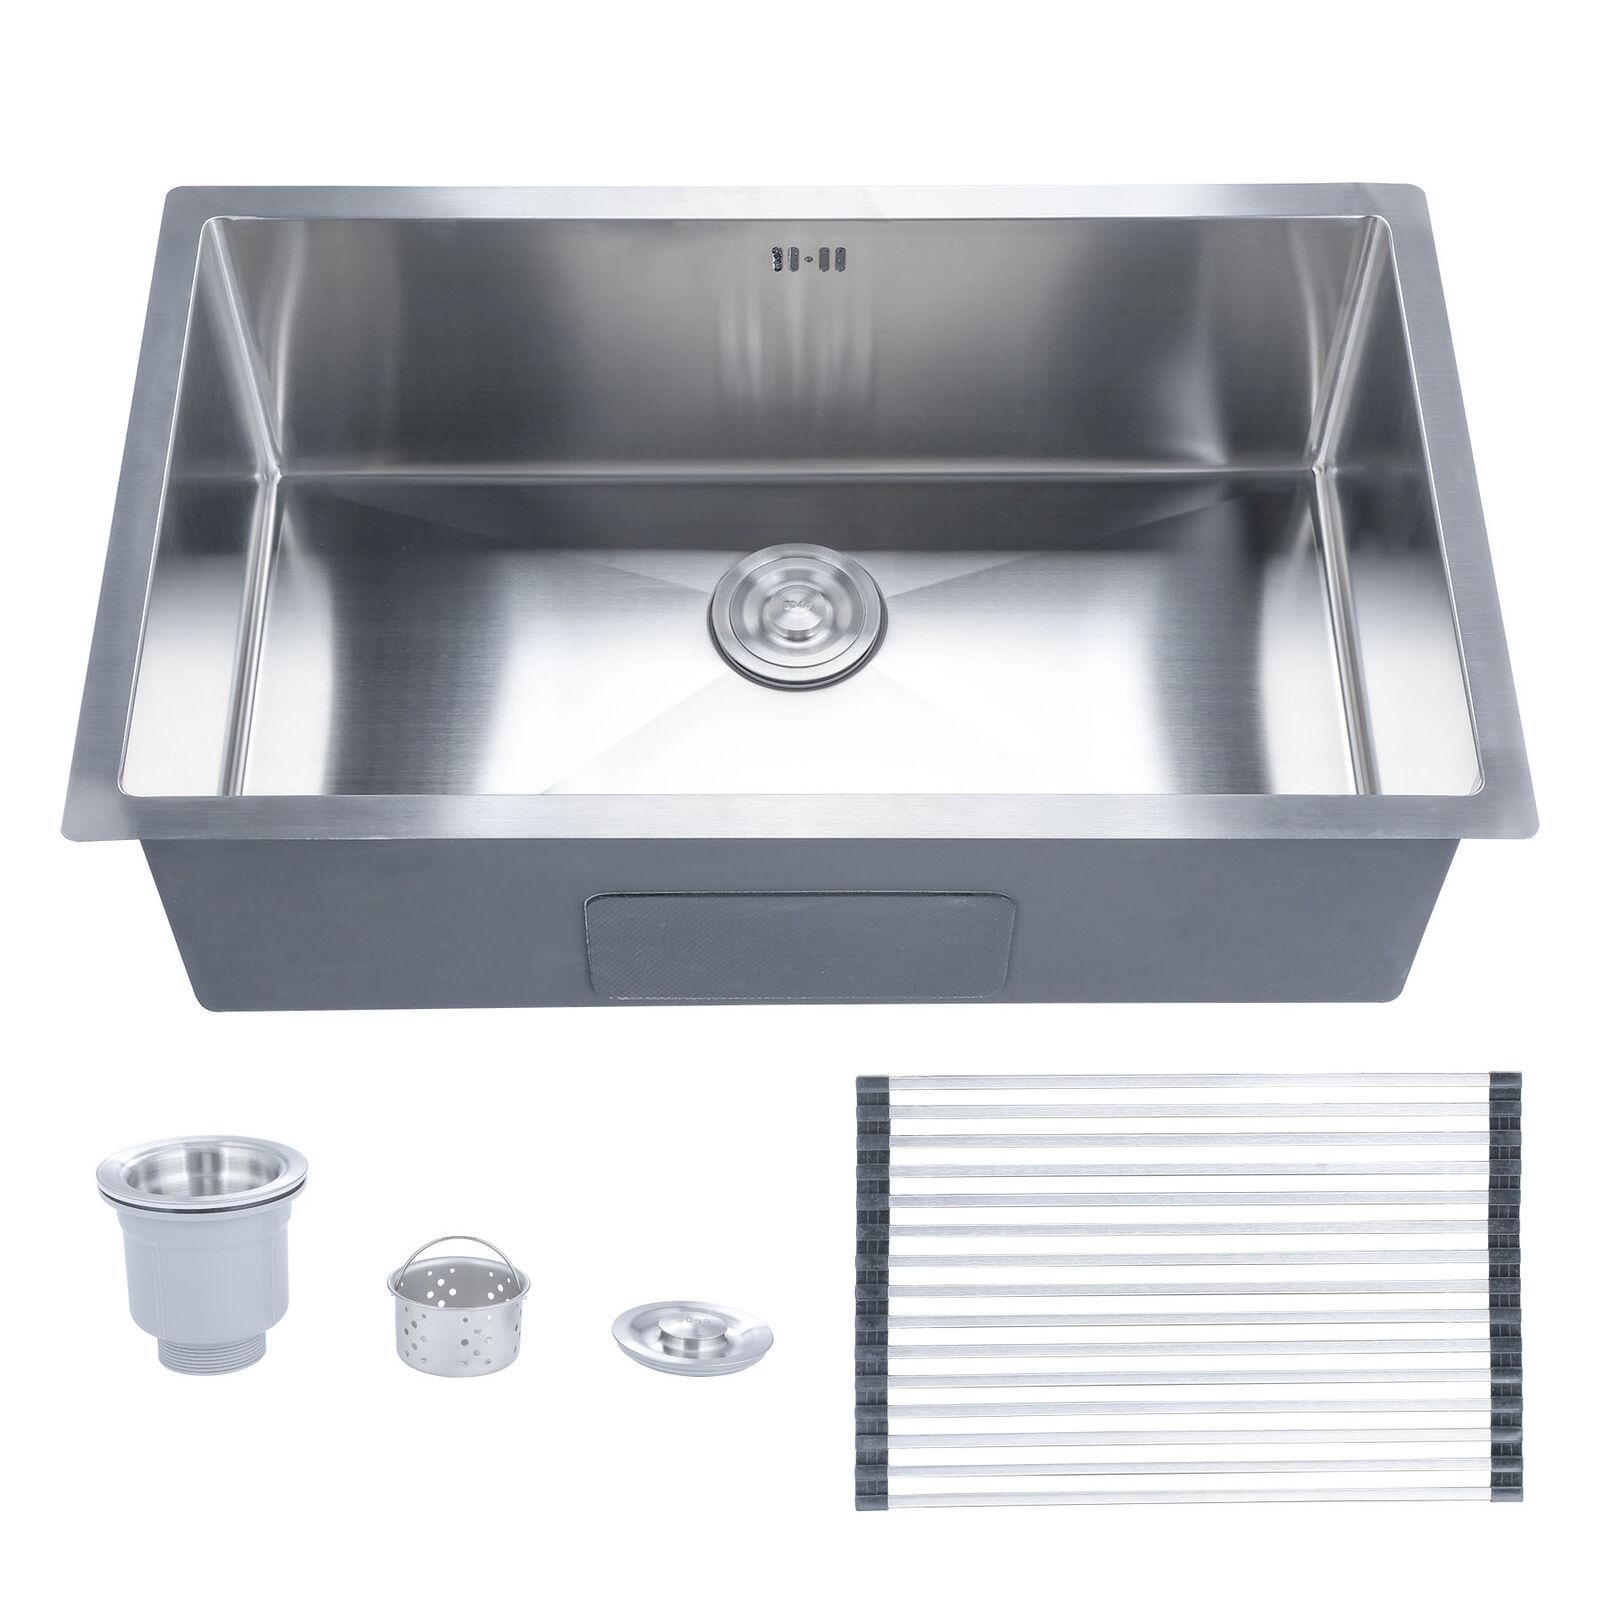 "28"" x 18"" x 9"" Top/Undermount Handmade Kitchen Sink Stainless Steel Single  Bowl"